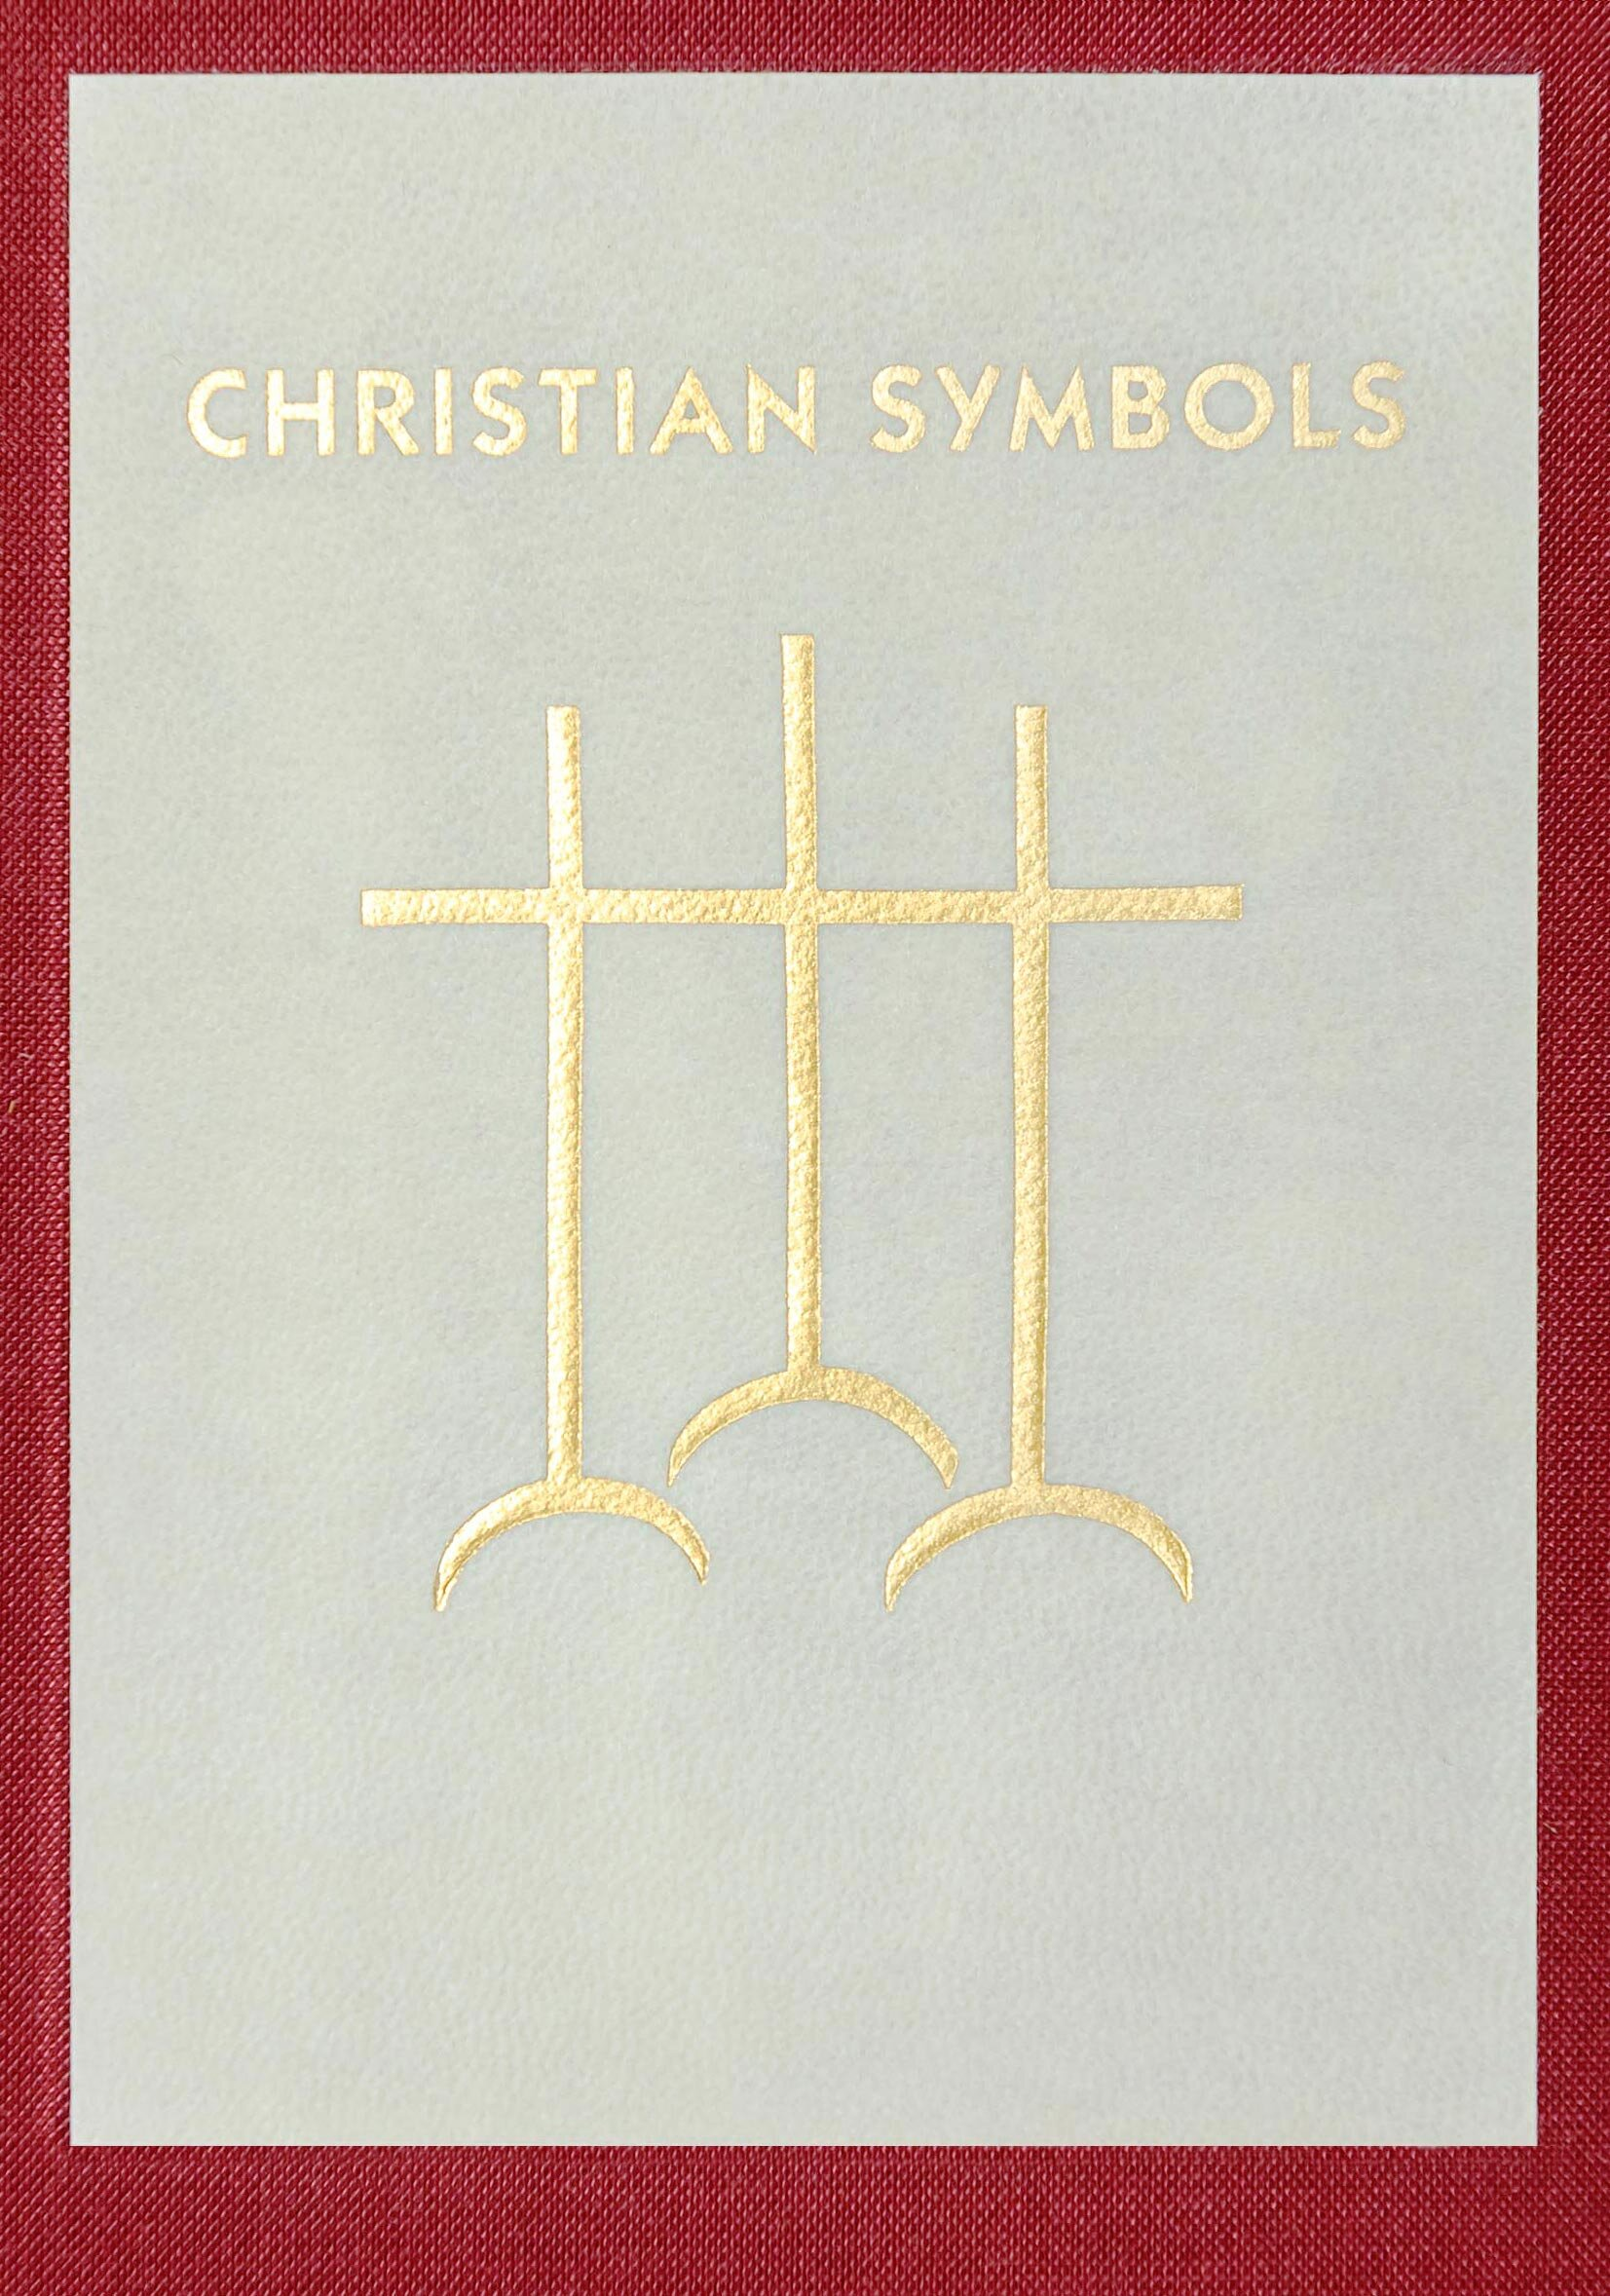 049_ChristianSymbols_JR_LABEL-0122.fix.jpg